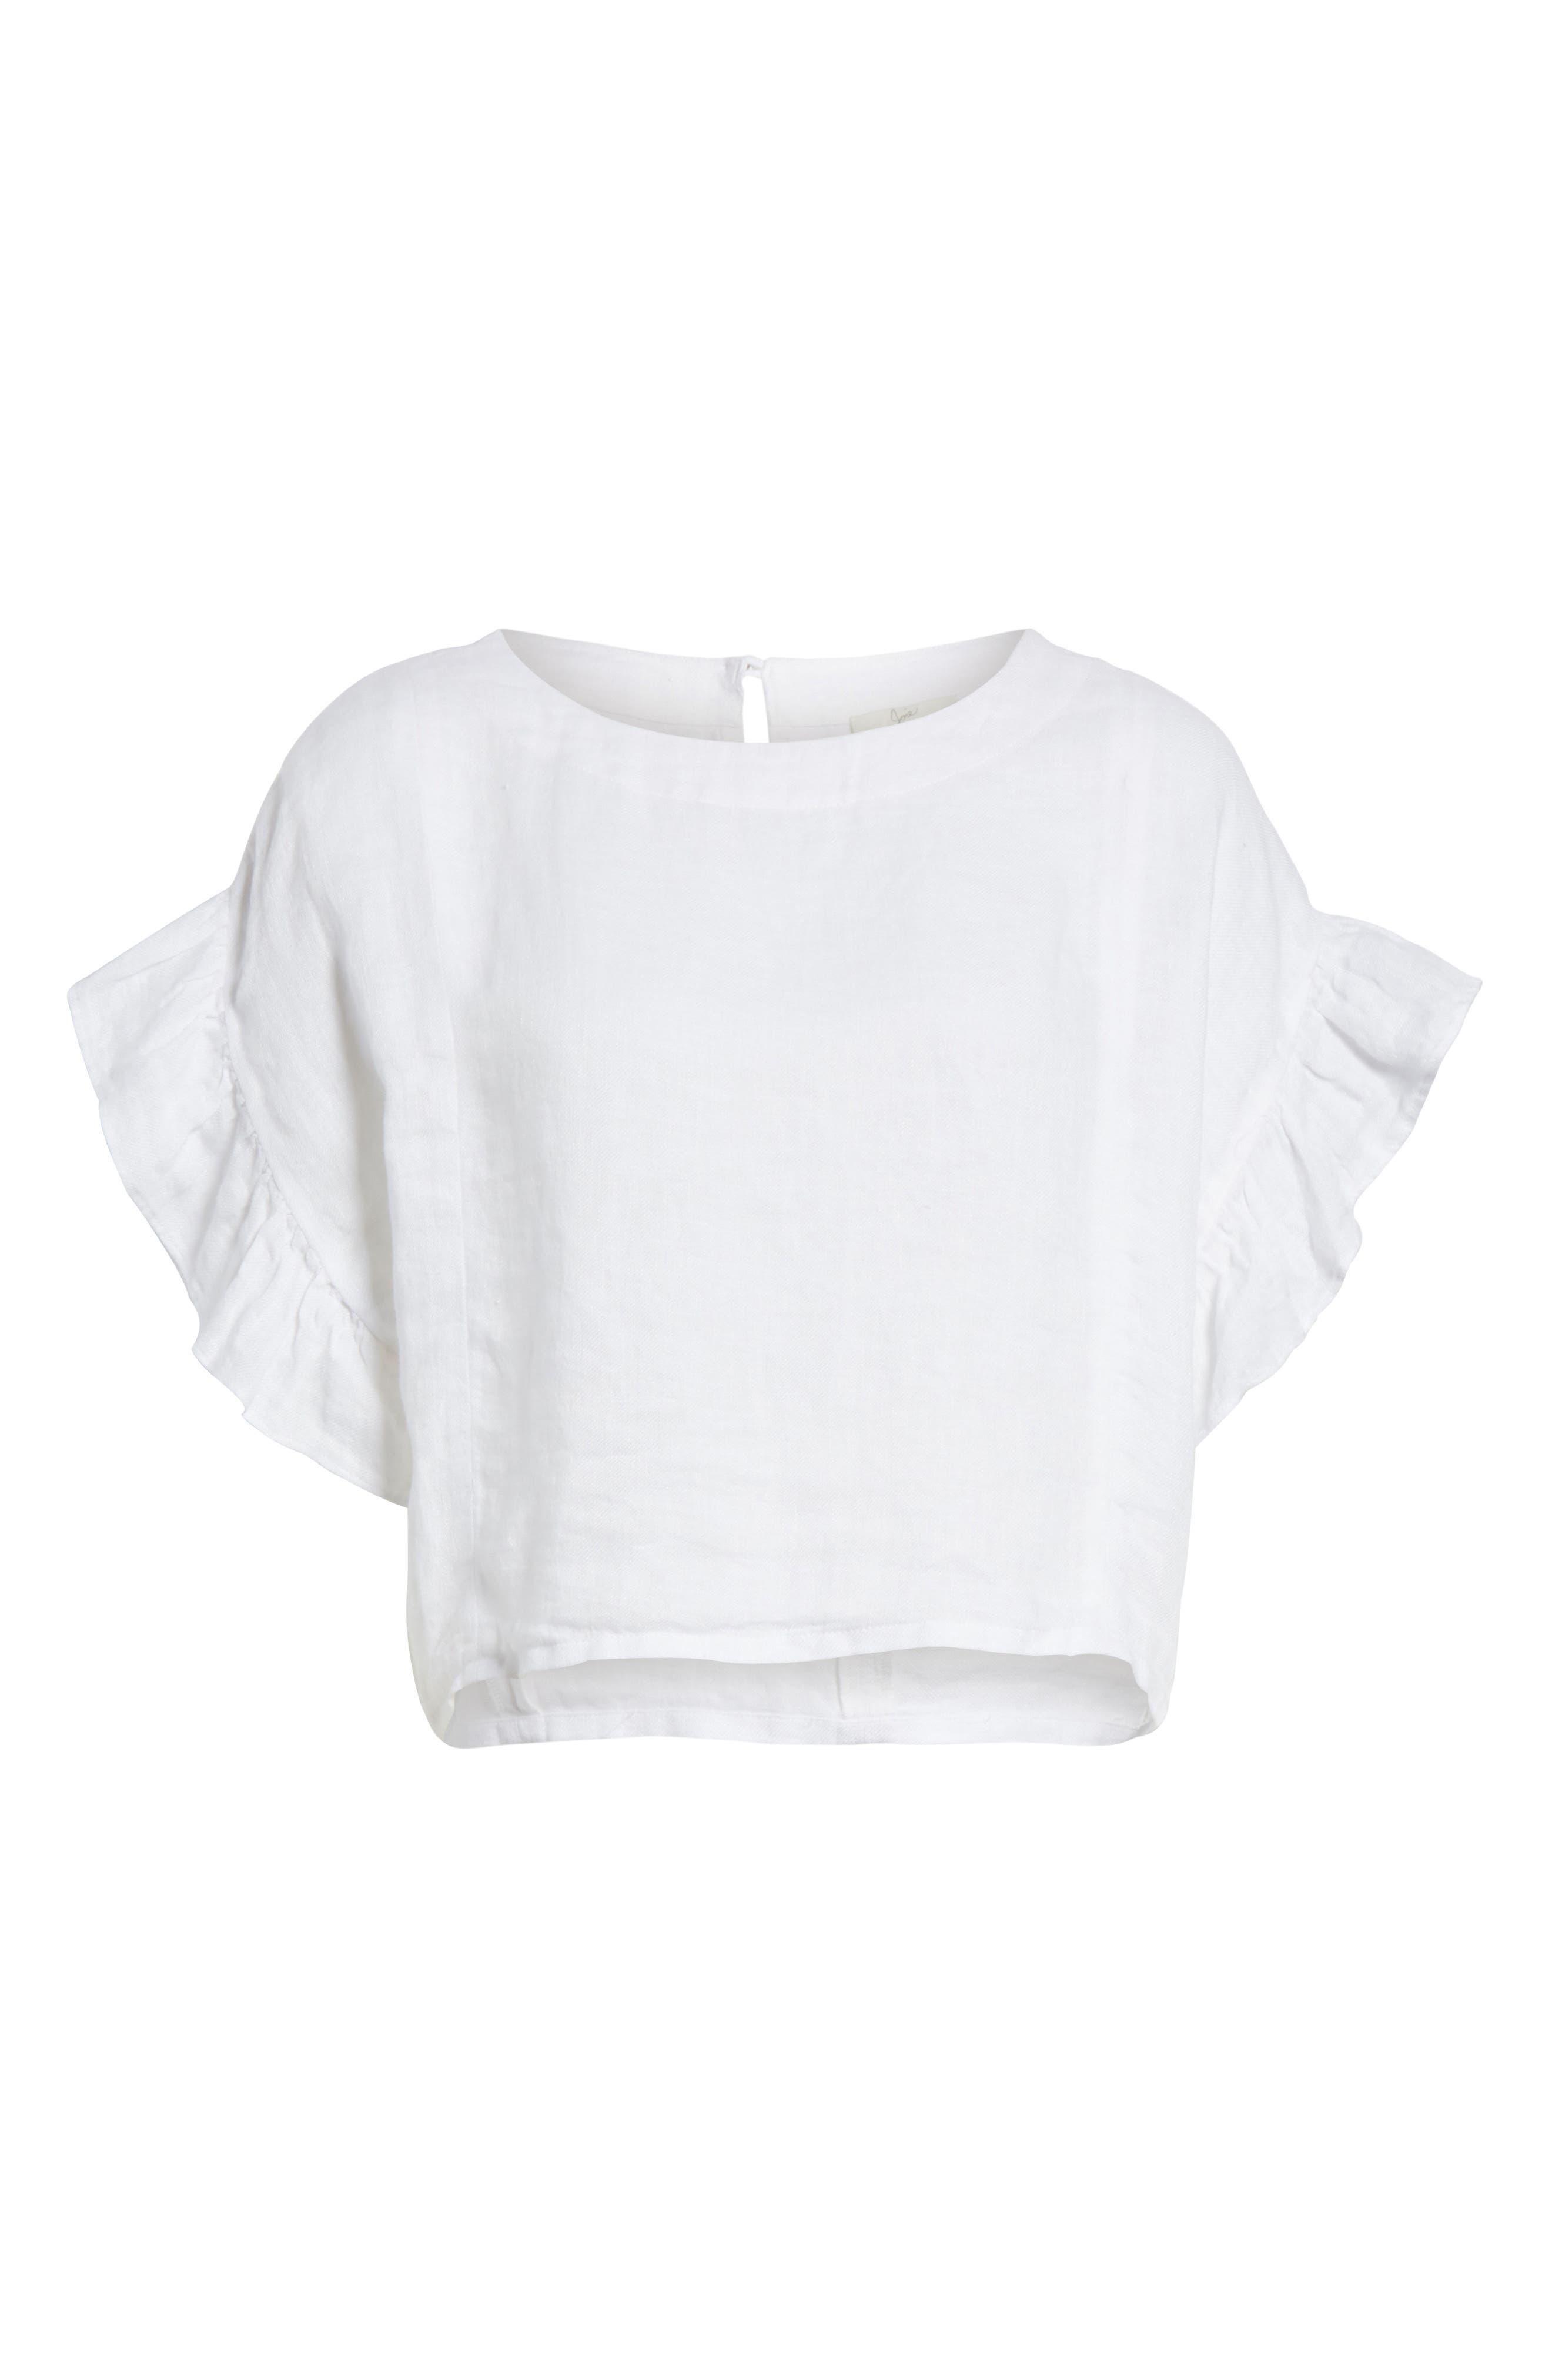 Febronia Ruffle Sleeve Linen Crop Top,                             Alternate thumbnail 6, color,                             Porcelain